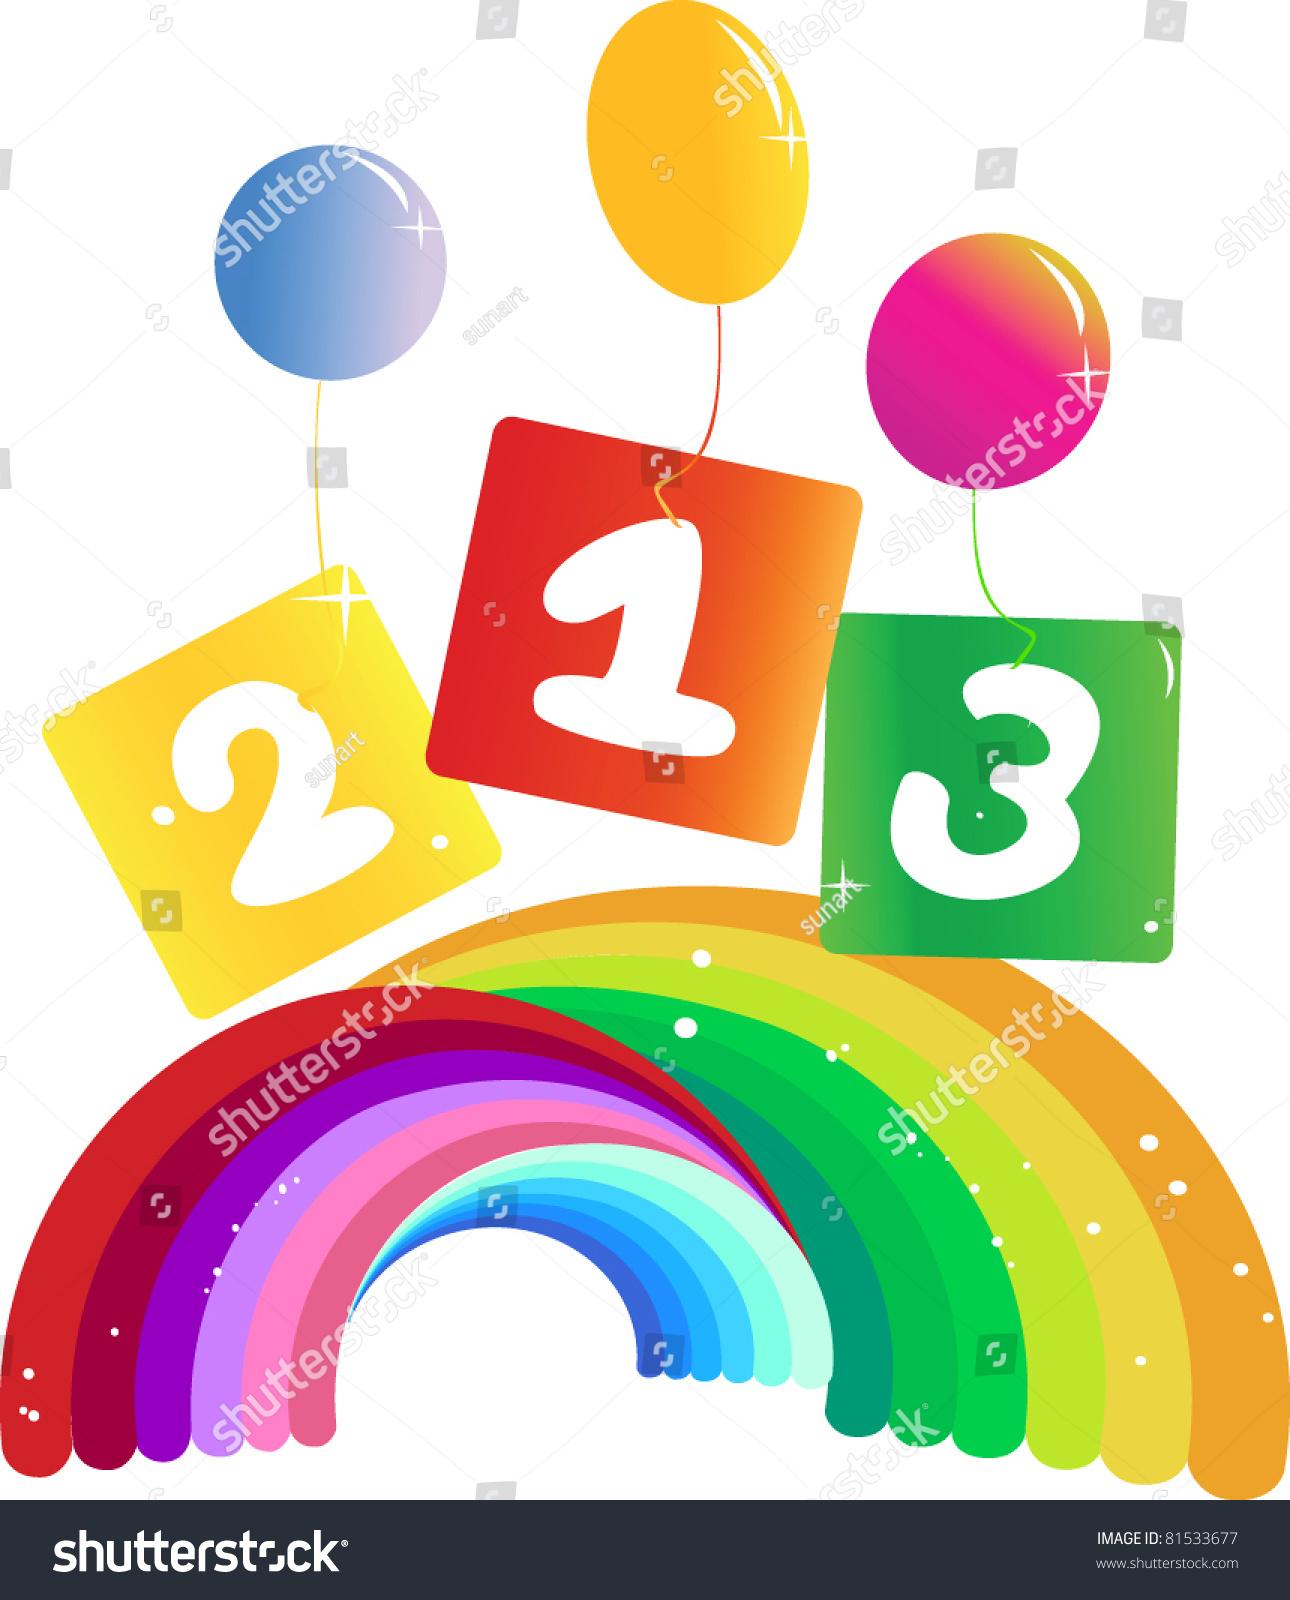 Cartoon Number 123 ,Rainbow And Balloons Stock Vector Illustration ...